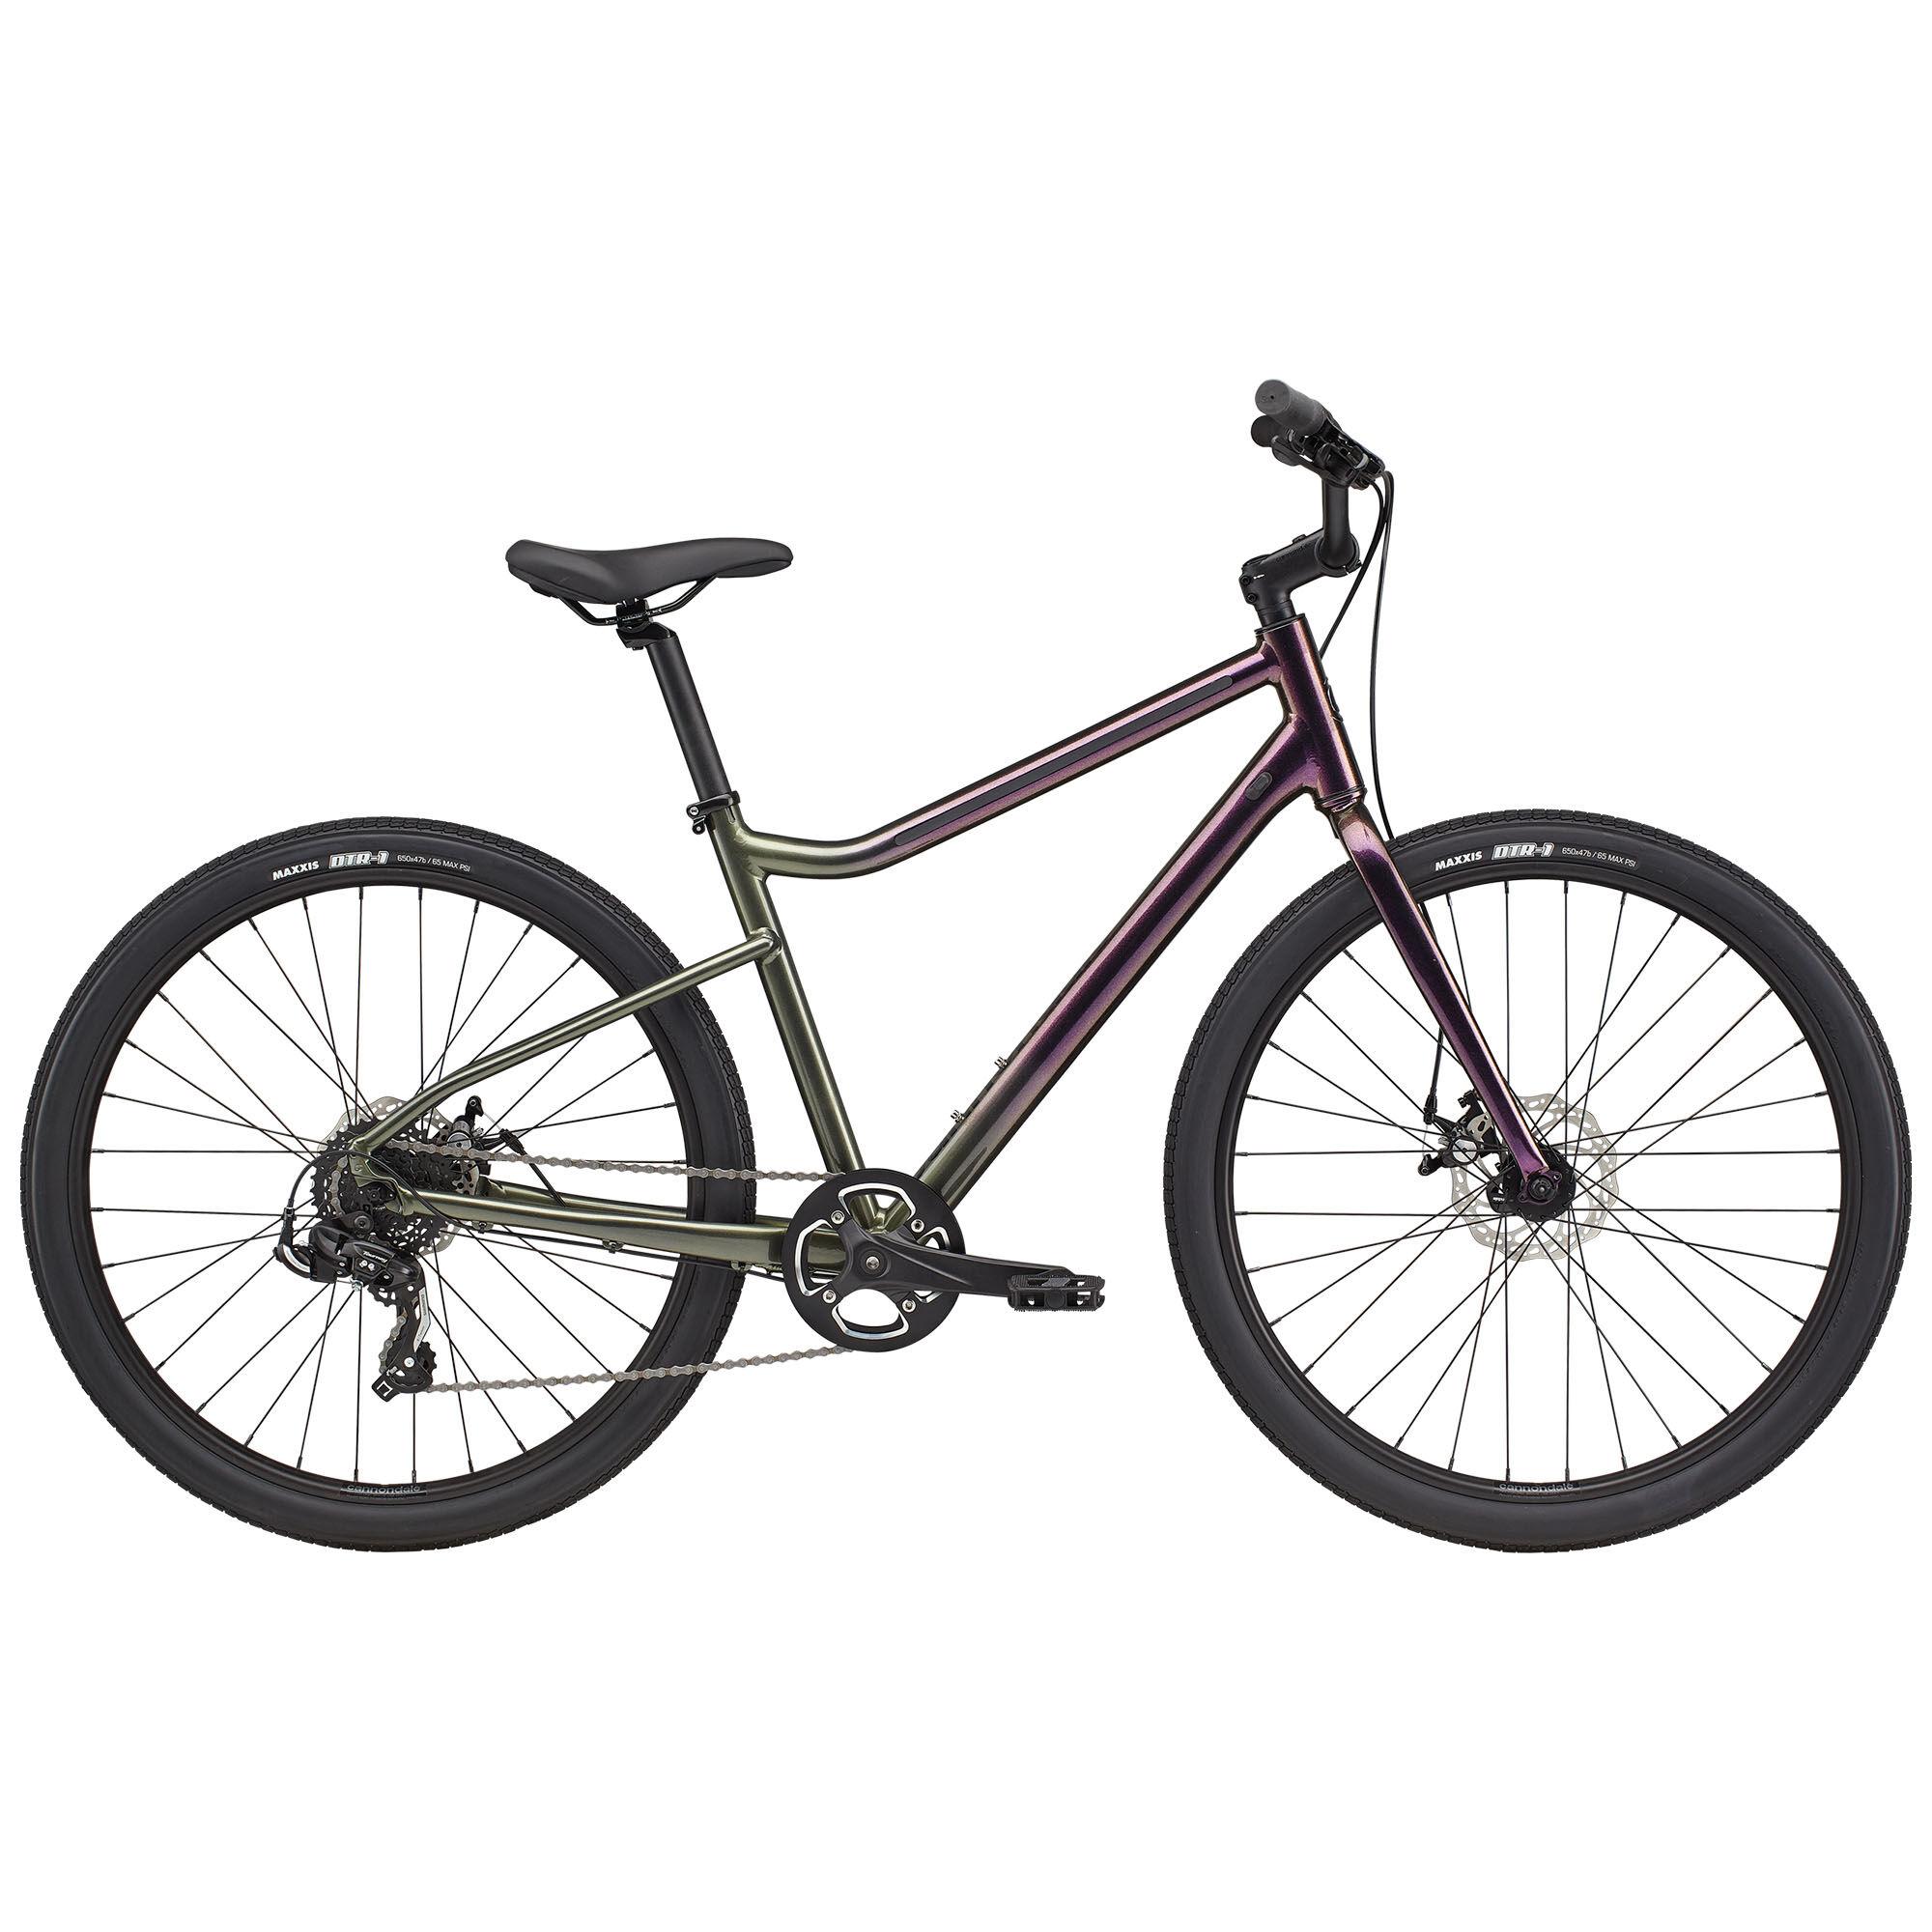 Cannondale Treadwell 3 LTD Urban Bike '21  - Highlighter - Size: Small